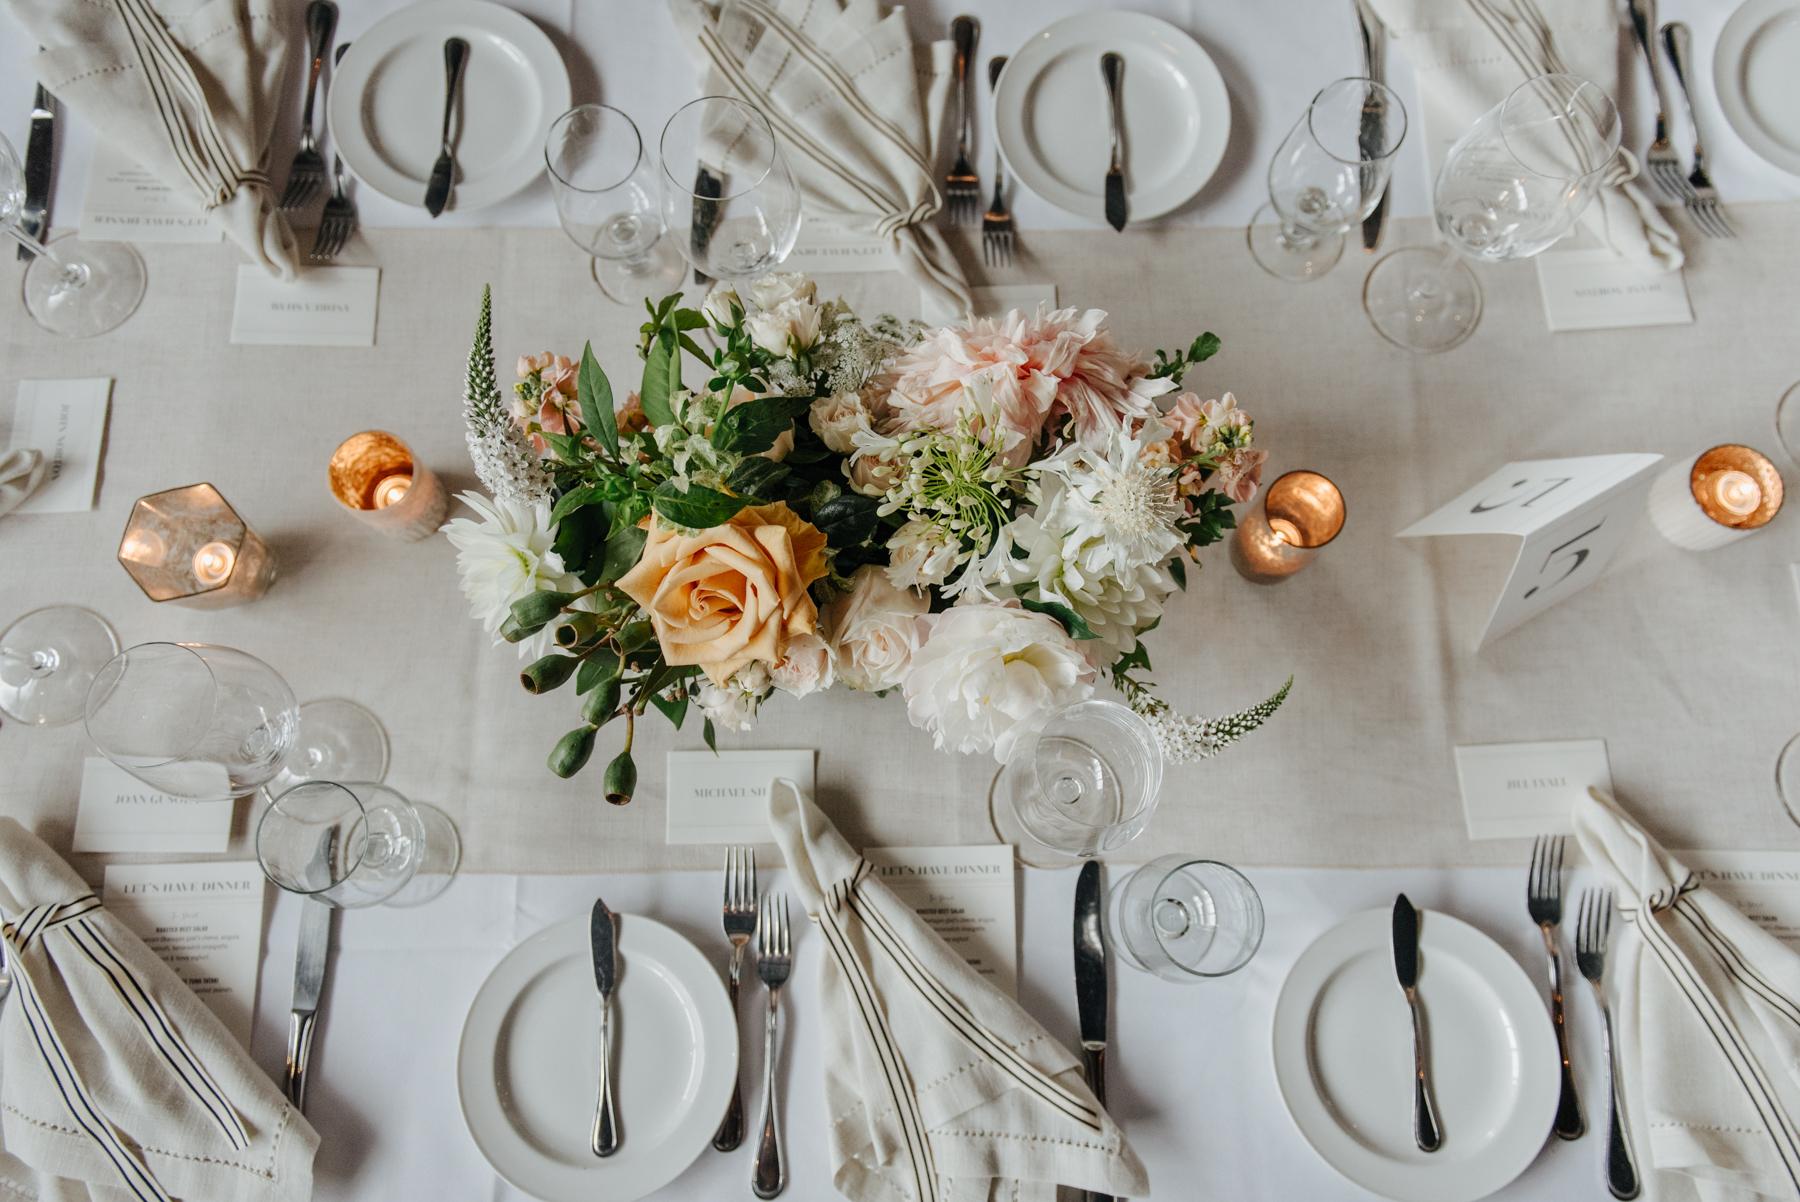 kaoverii_silva_photographer_cynthia_richard_wedding_vancouver_brix_&_mortar-24.jpg